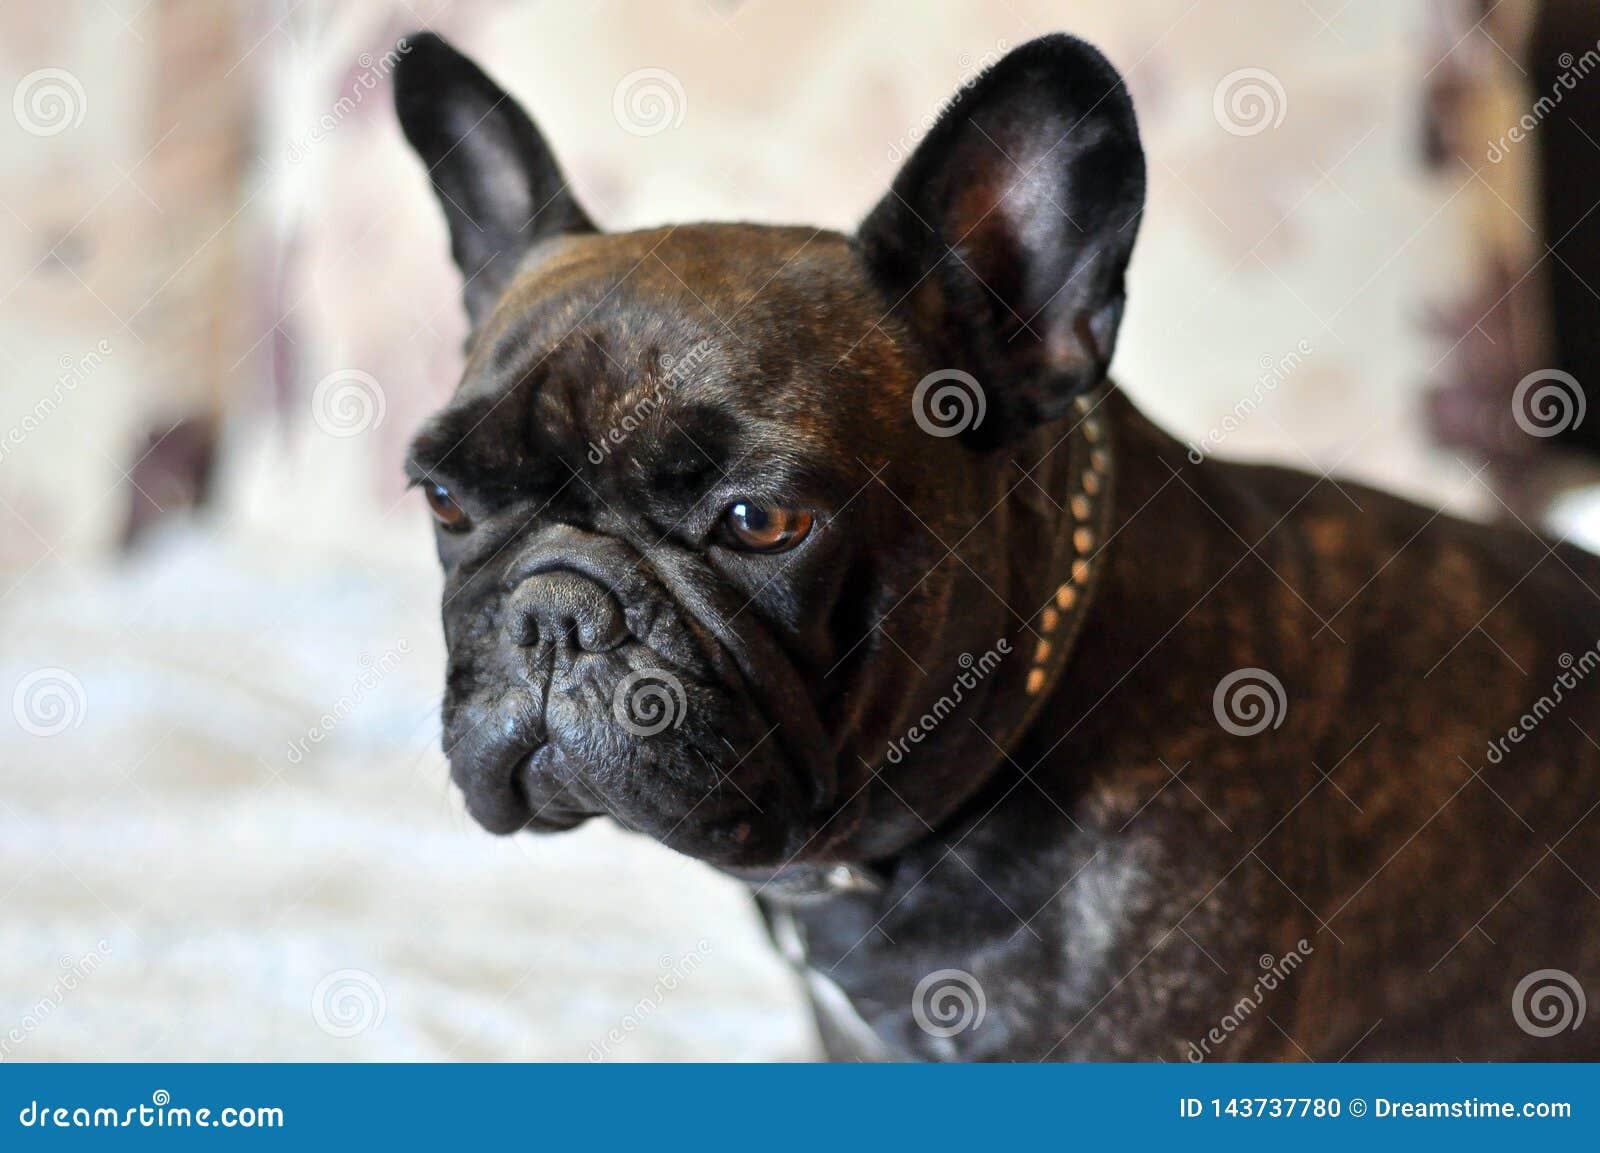 De Franse Buldog is een hond, beste vriend